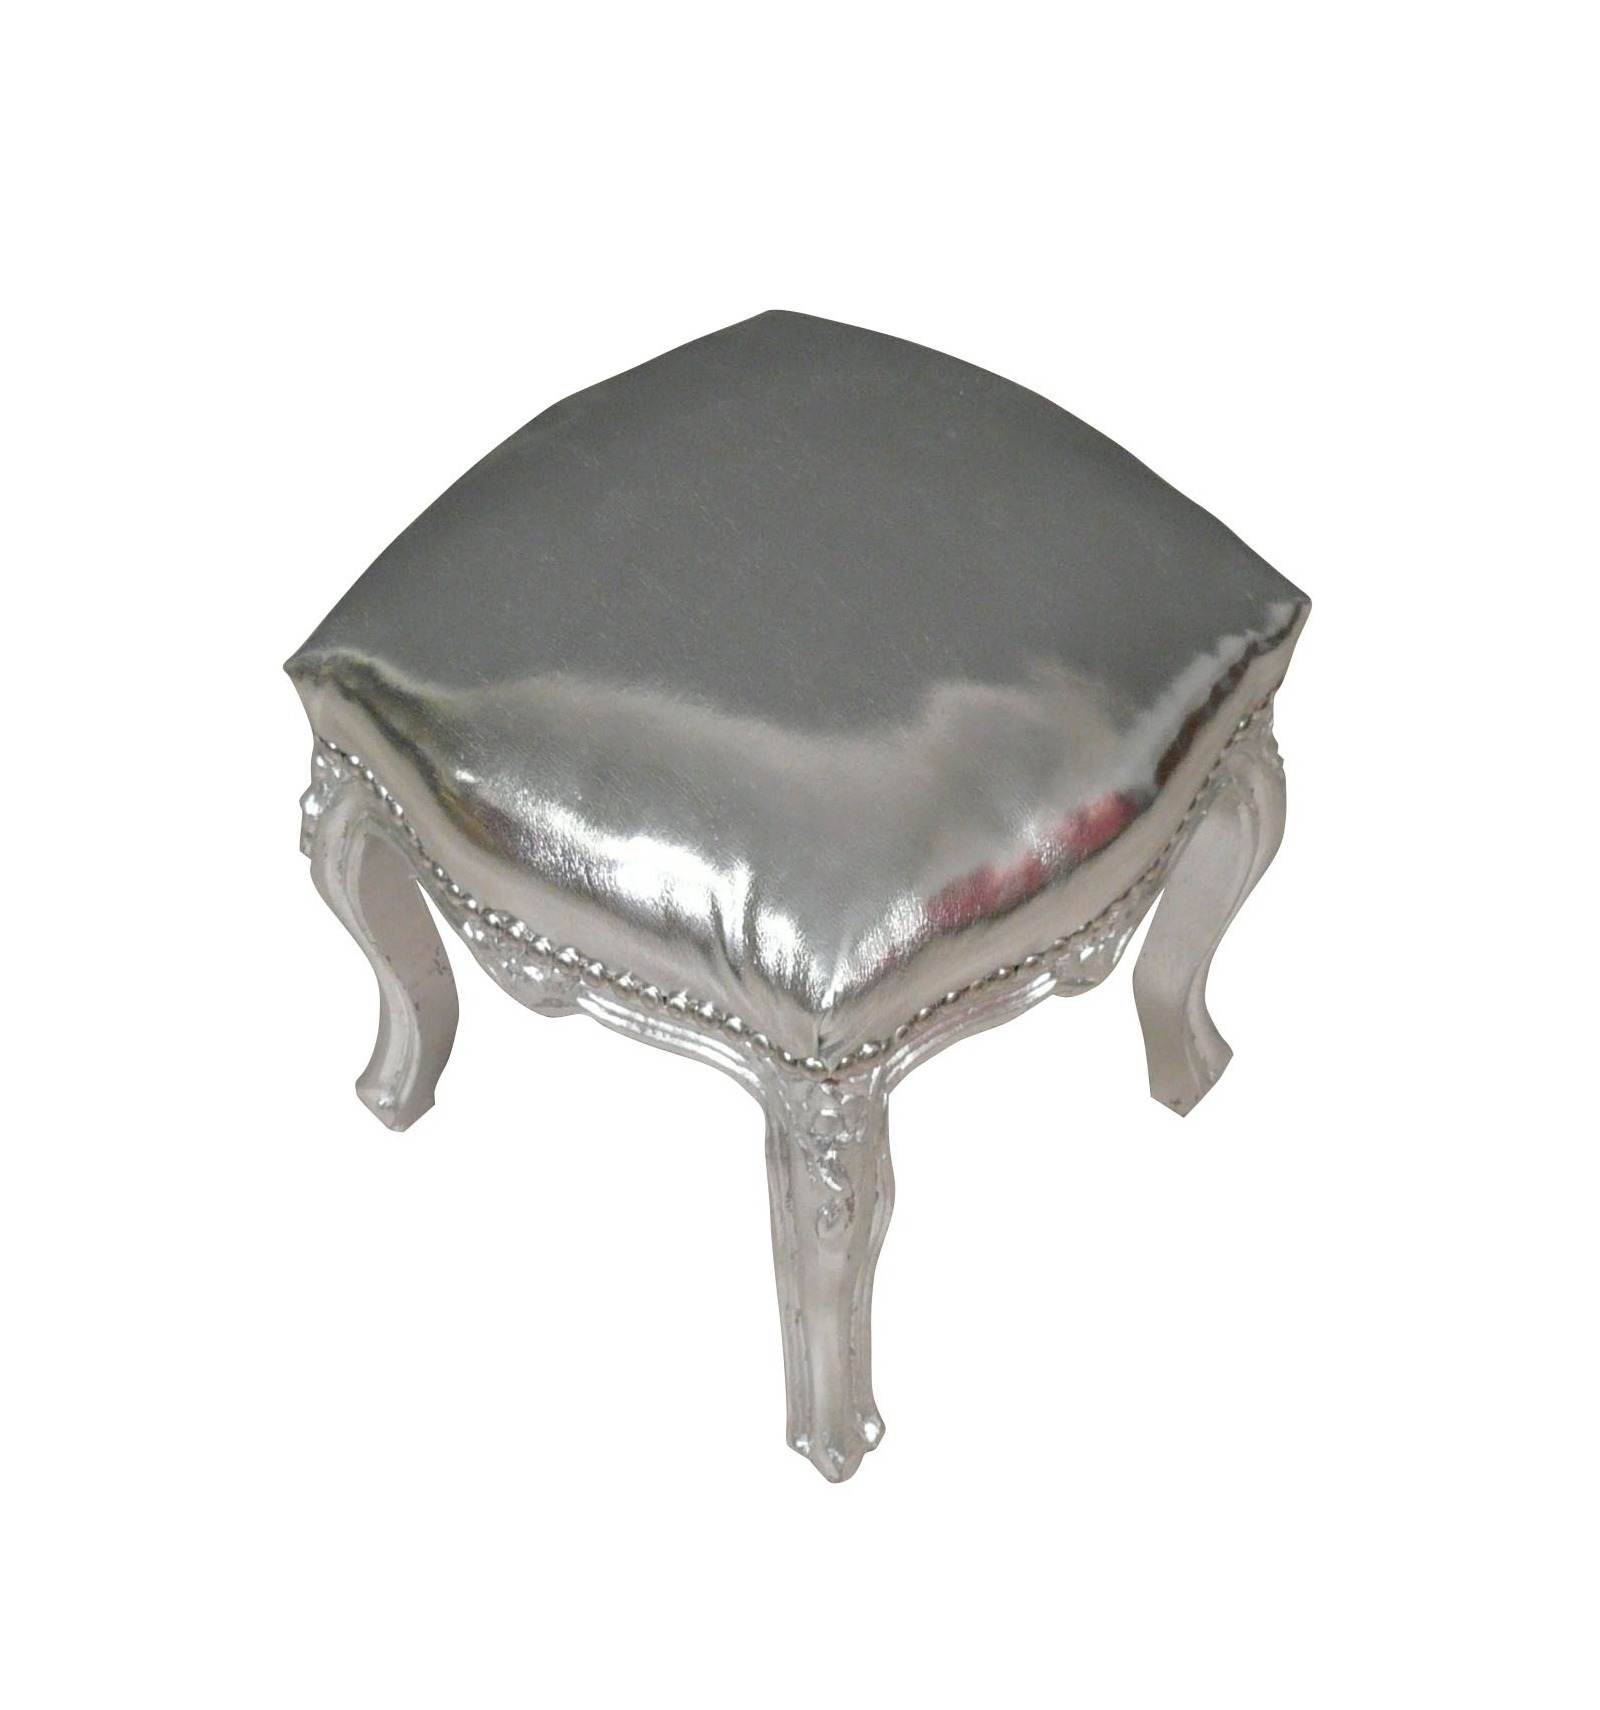 Barroco otomano plata - Sillones barrocos